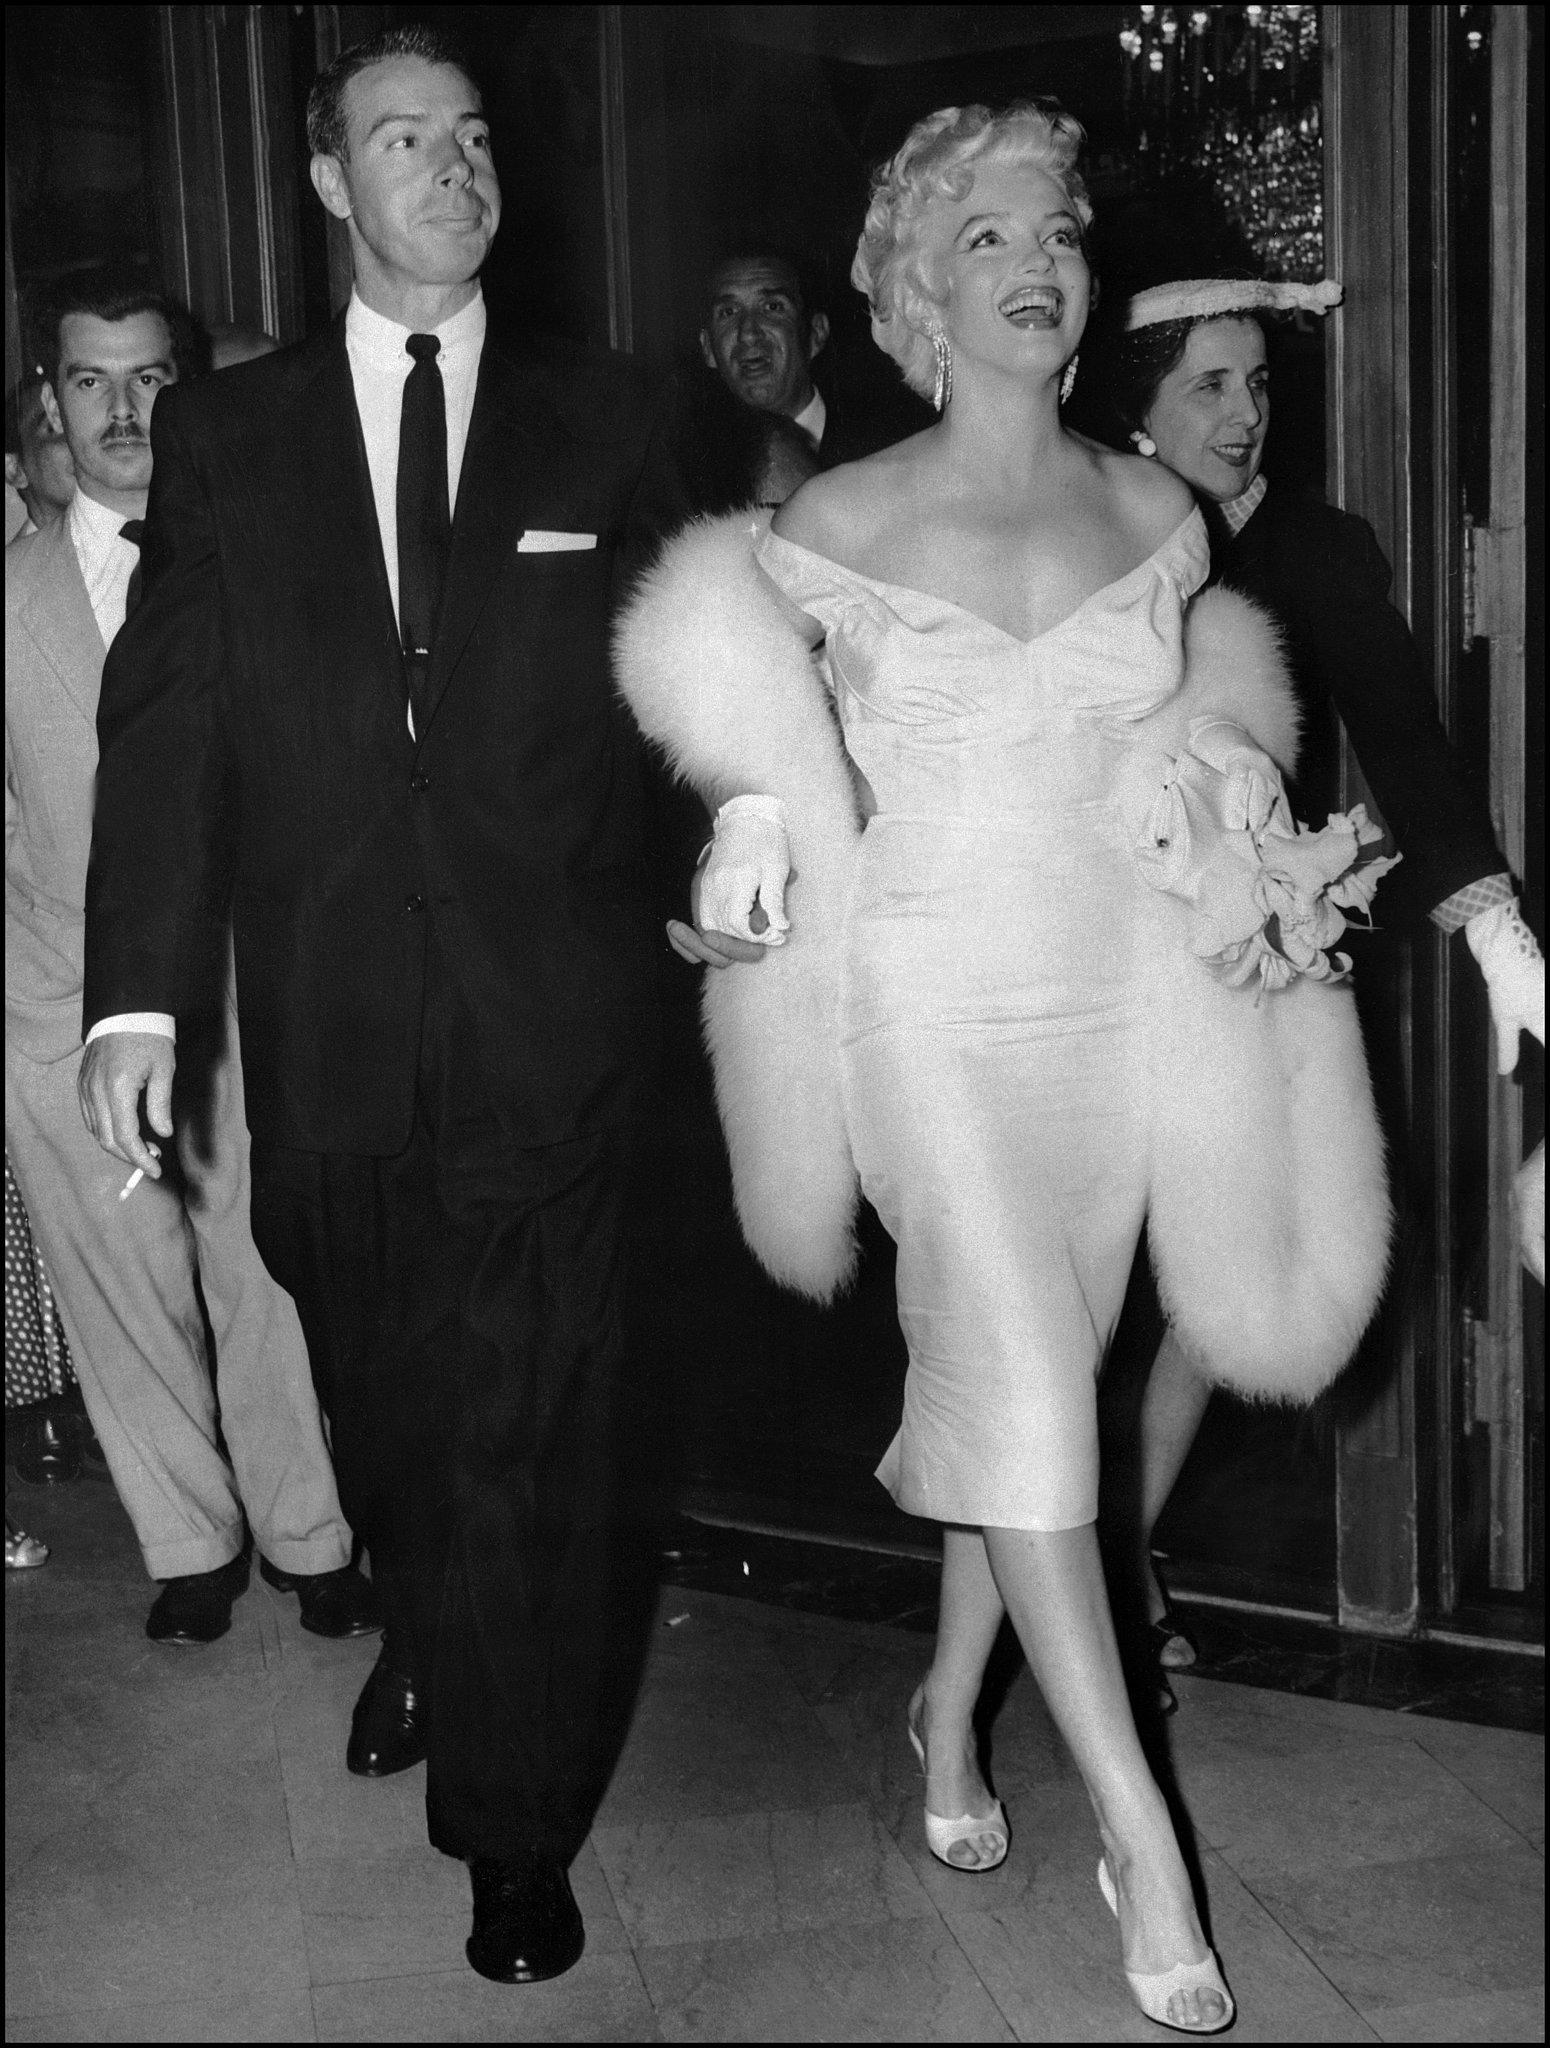 Marilyn Monroe With Joe DiMaggio in 1950